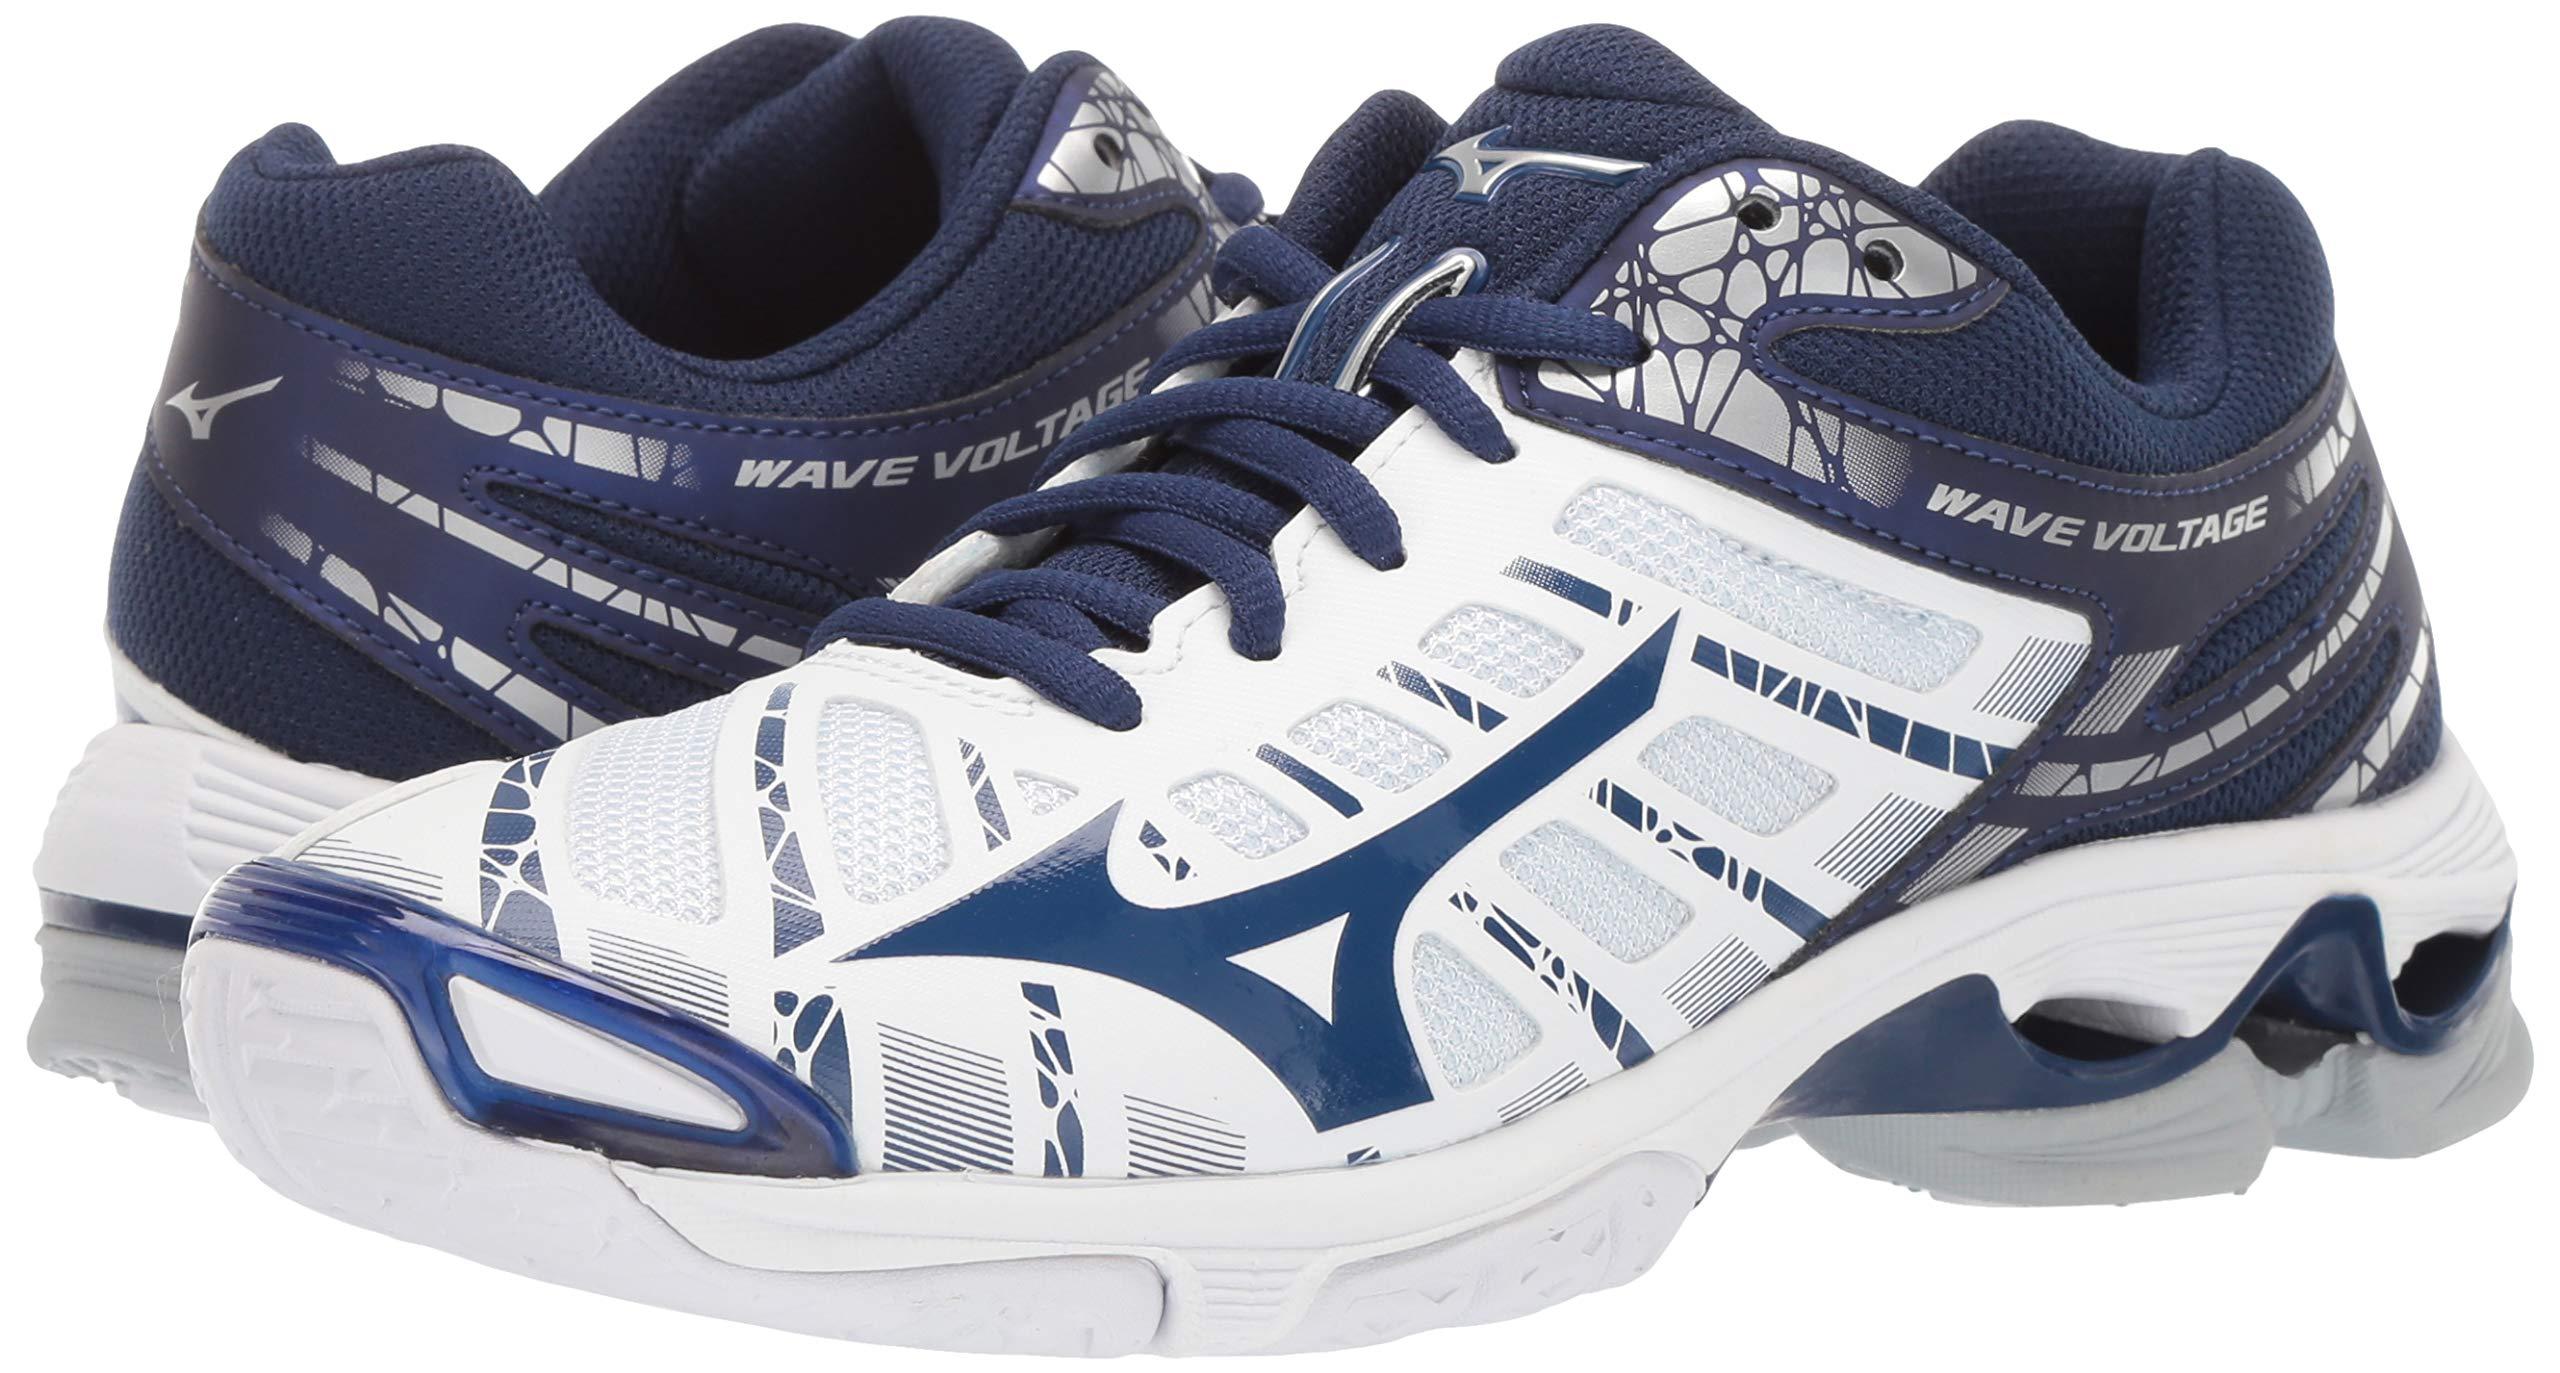 mizuno women's wave luminous volleyball shoes zipper